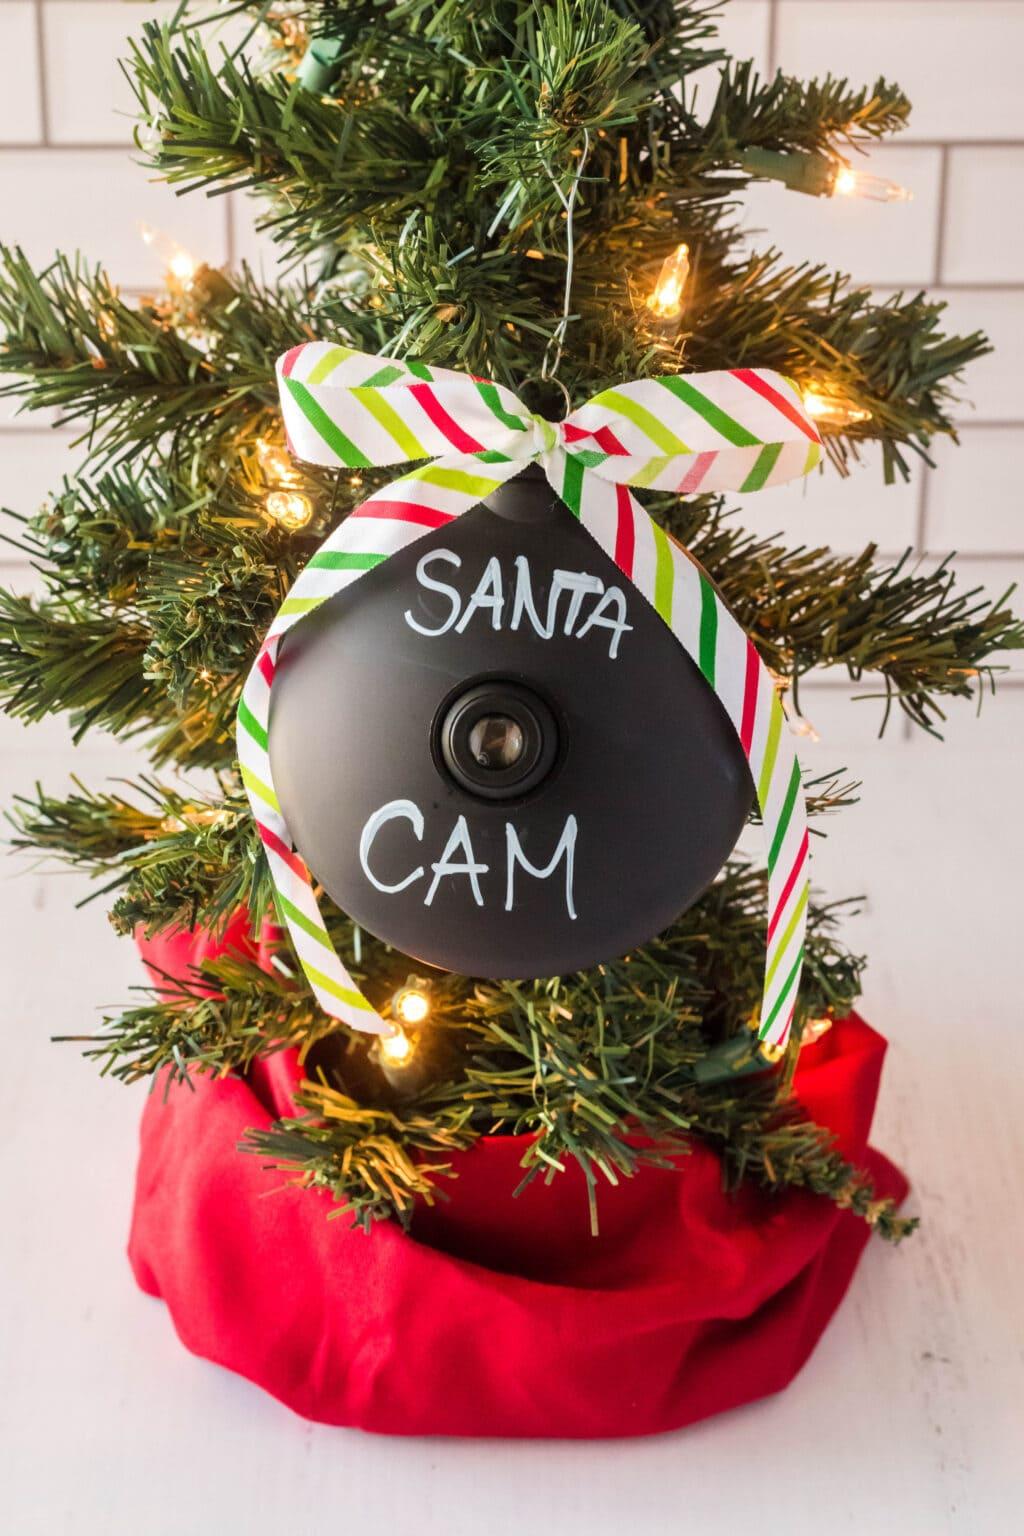 Santa cam ornament hanging on tree